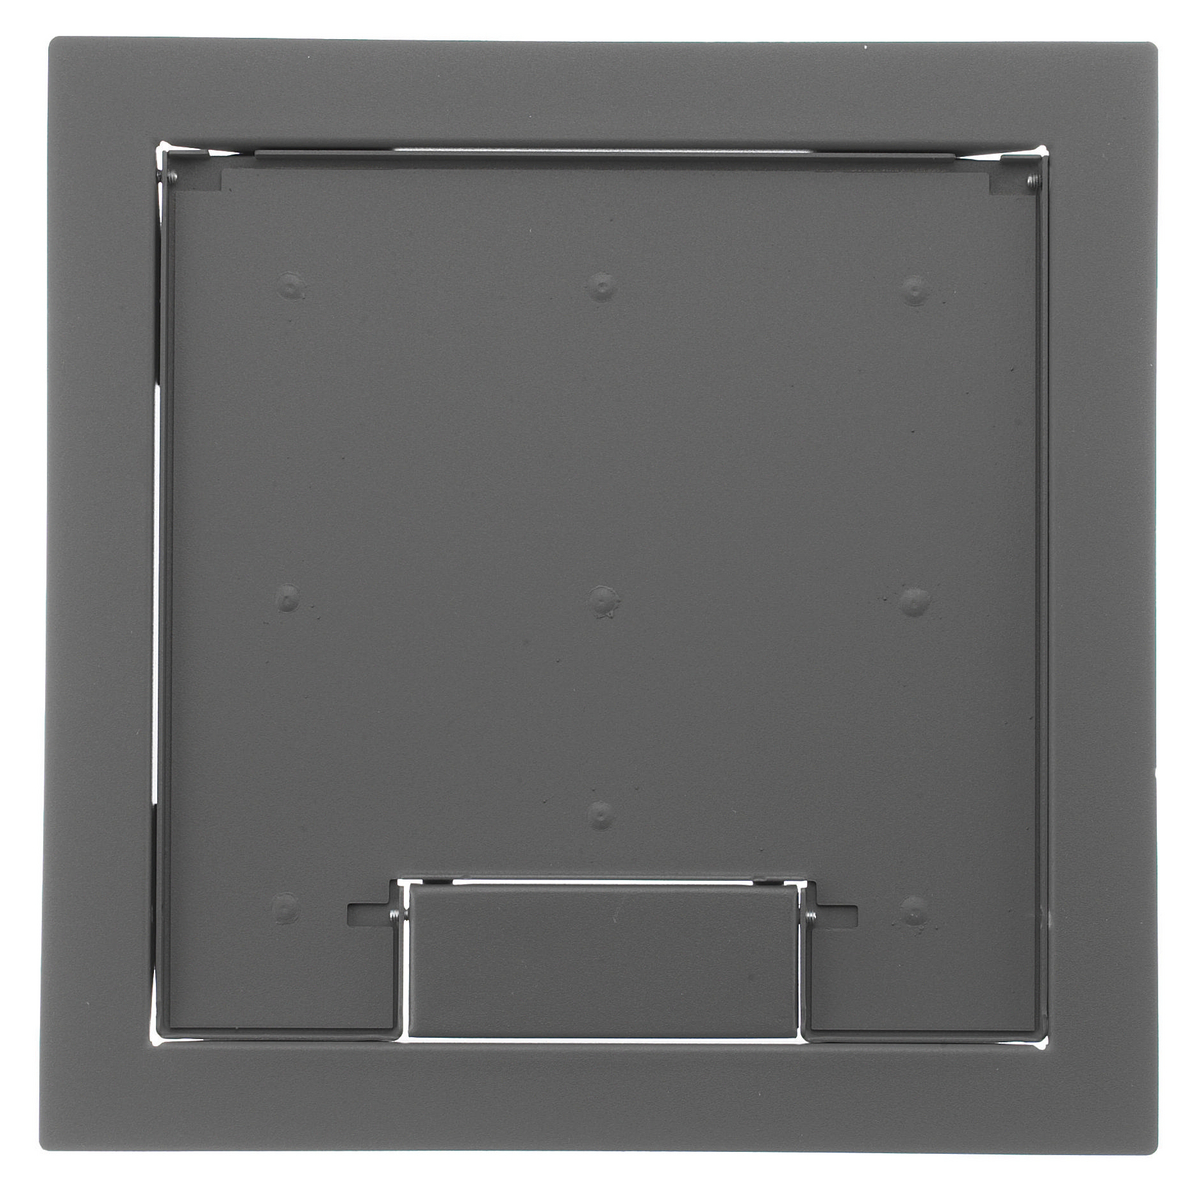 Hubbell HBLTCGNTACCESS F-BOX COVER, GRANITE